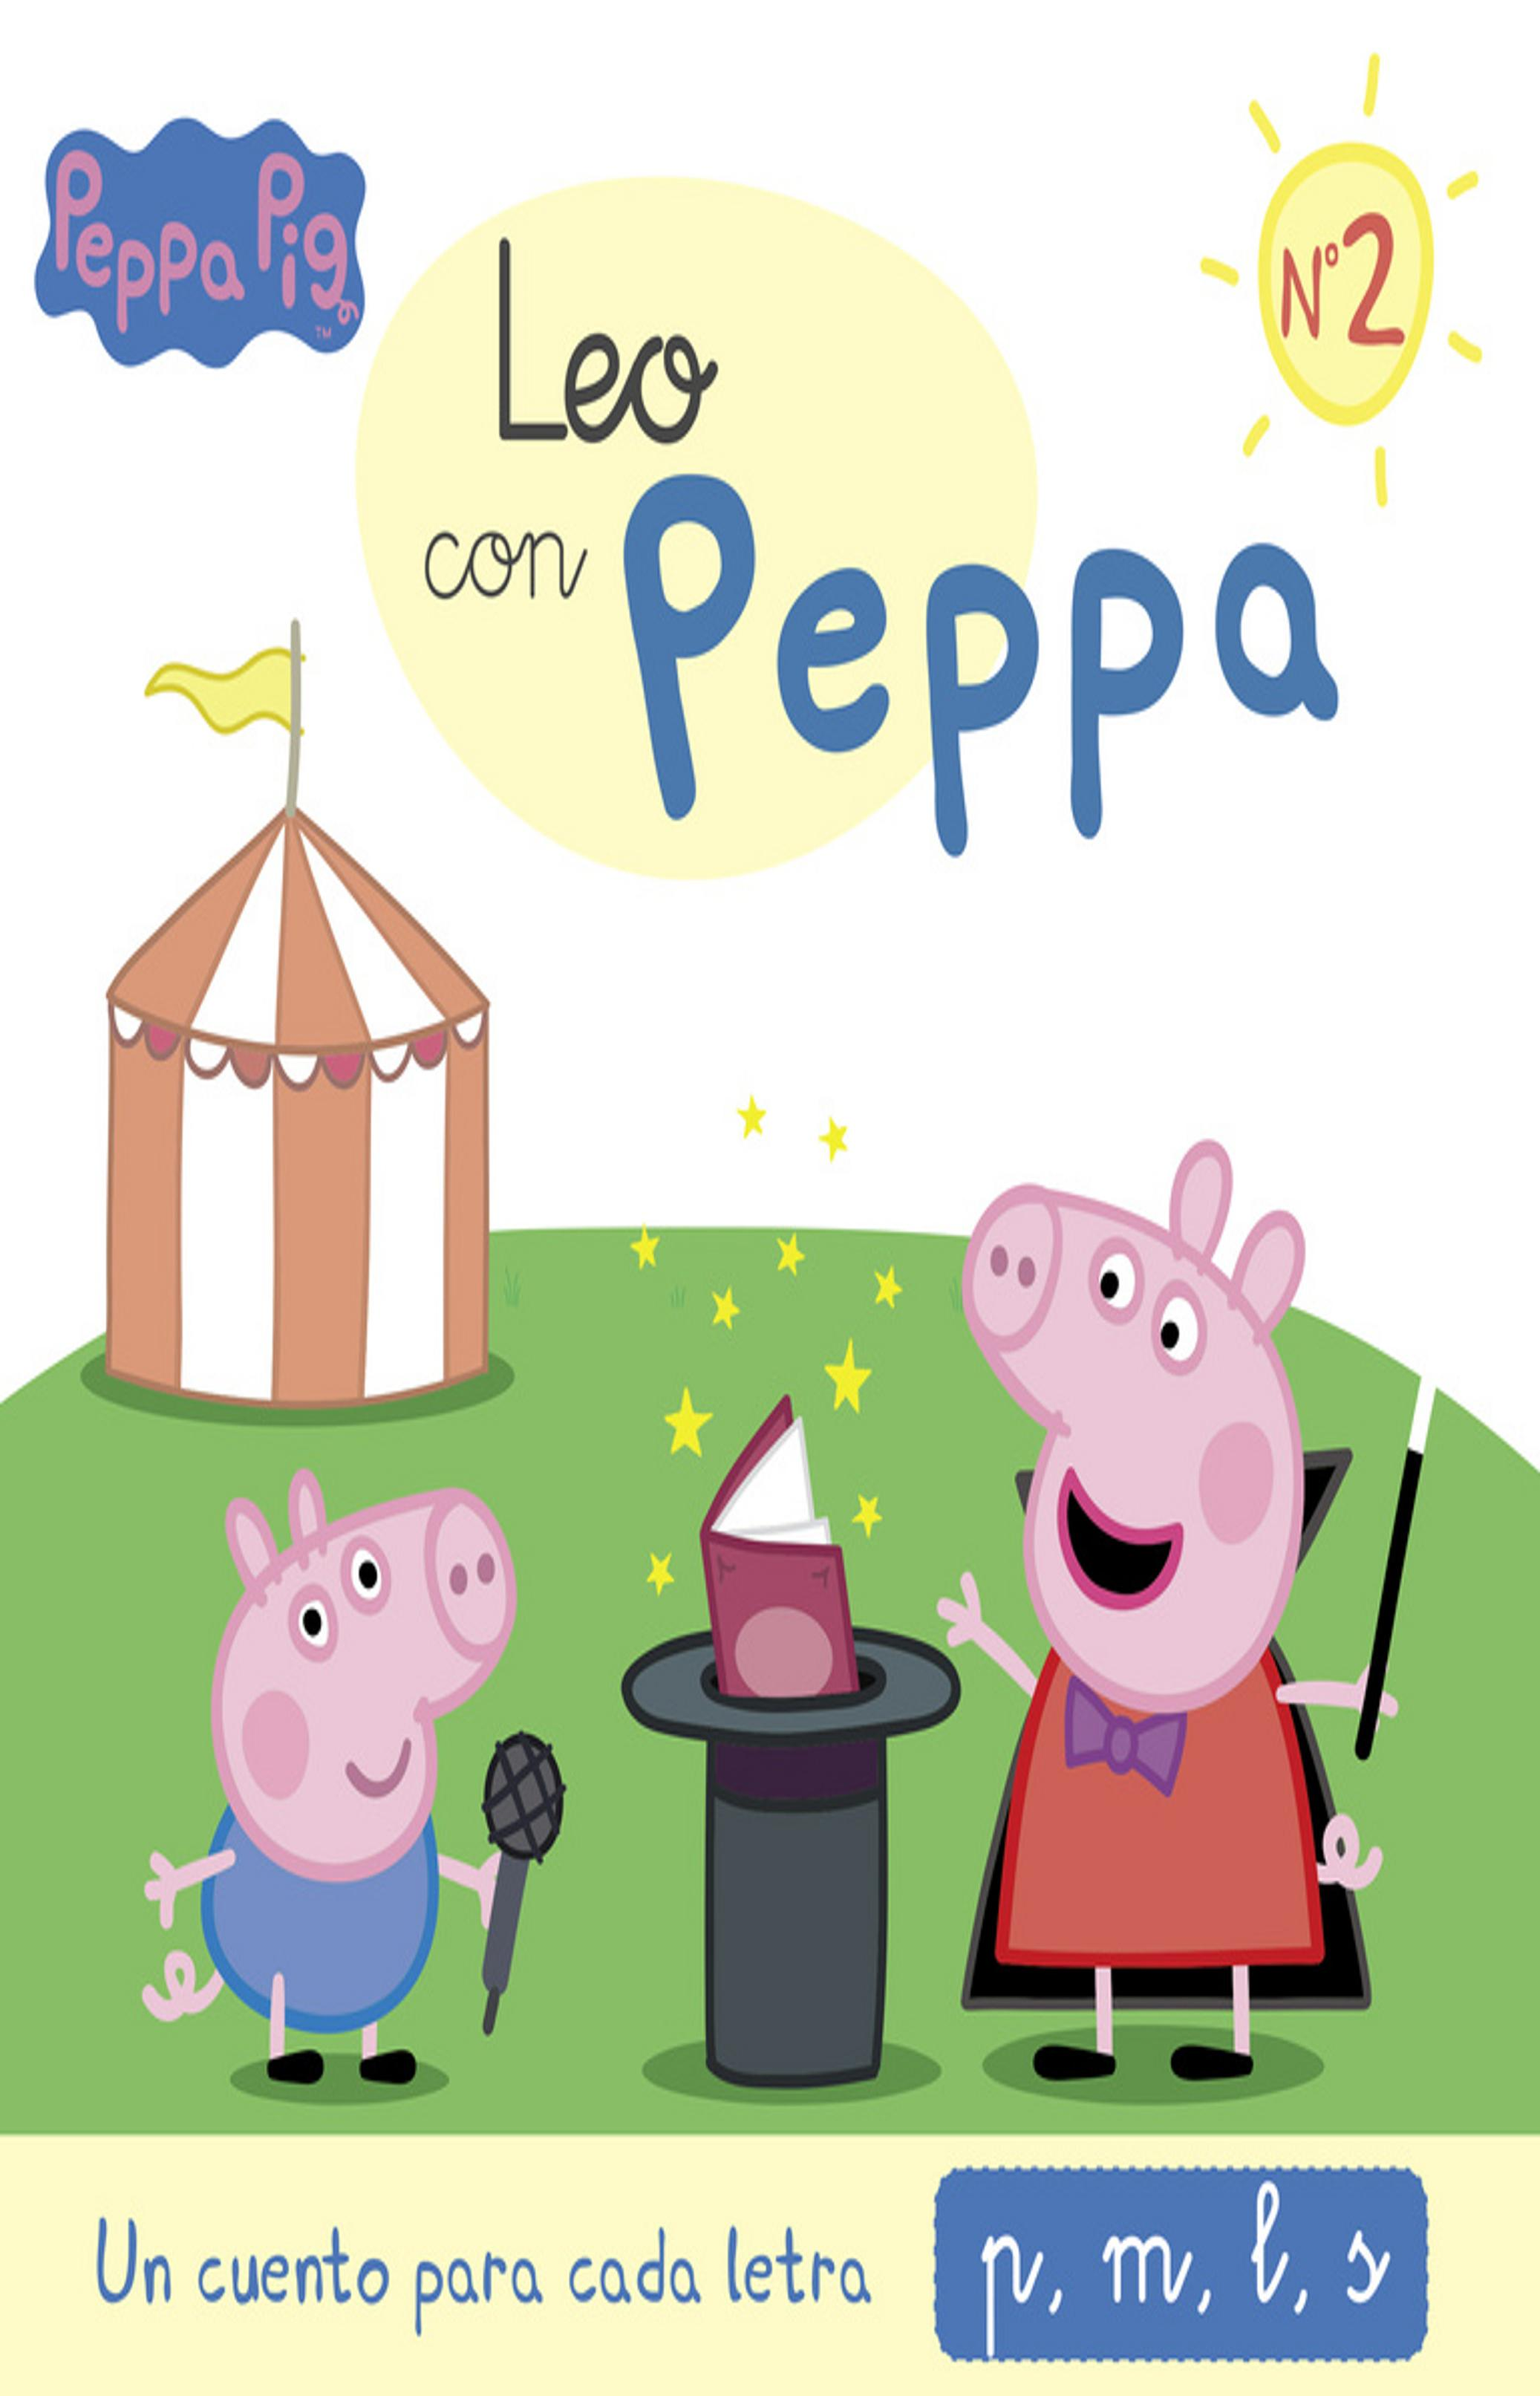 LEO CON PEPPA Nº1 (P,M,L,S) - Peppa Pig